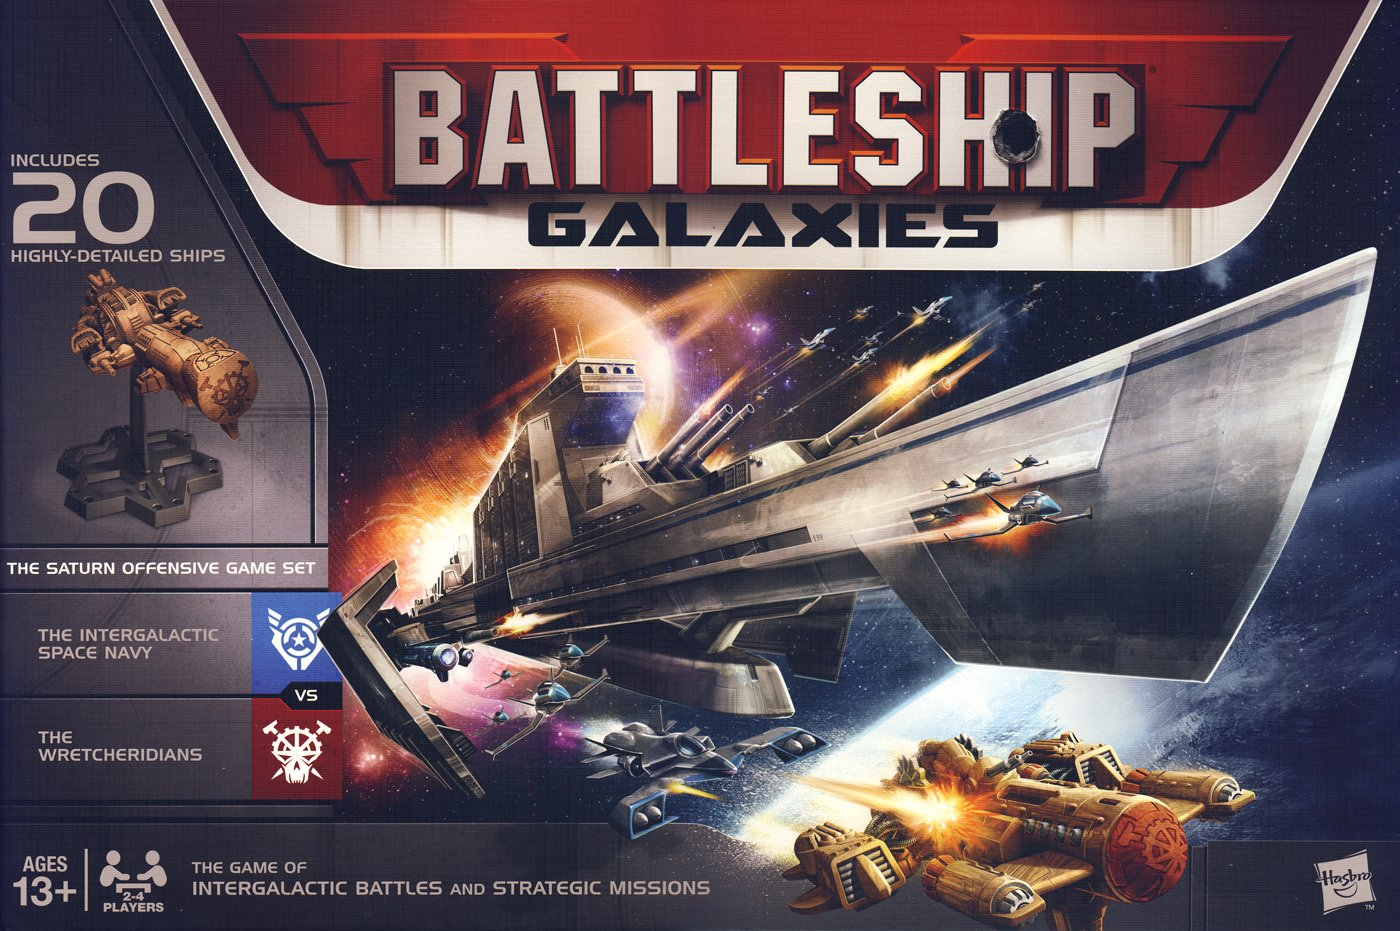 Wizards of the Coast 169212040 - Battleship Galaxies, Strategiespiel